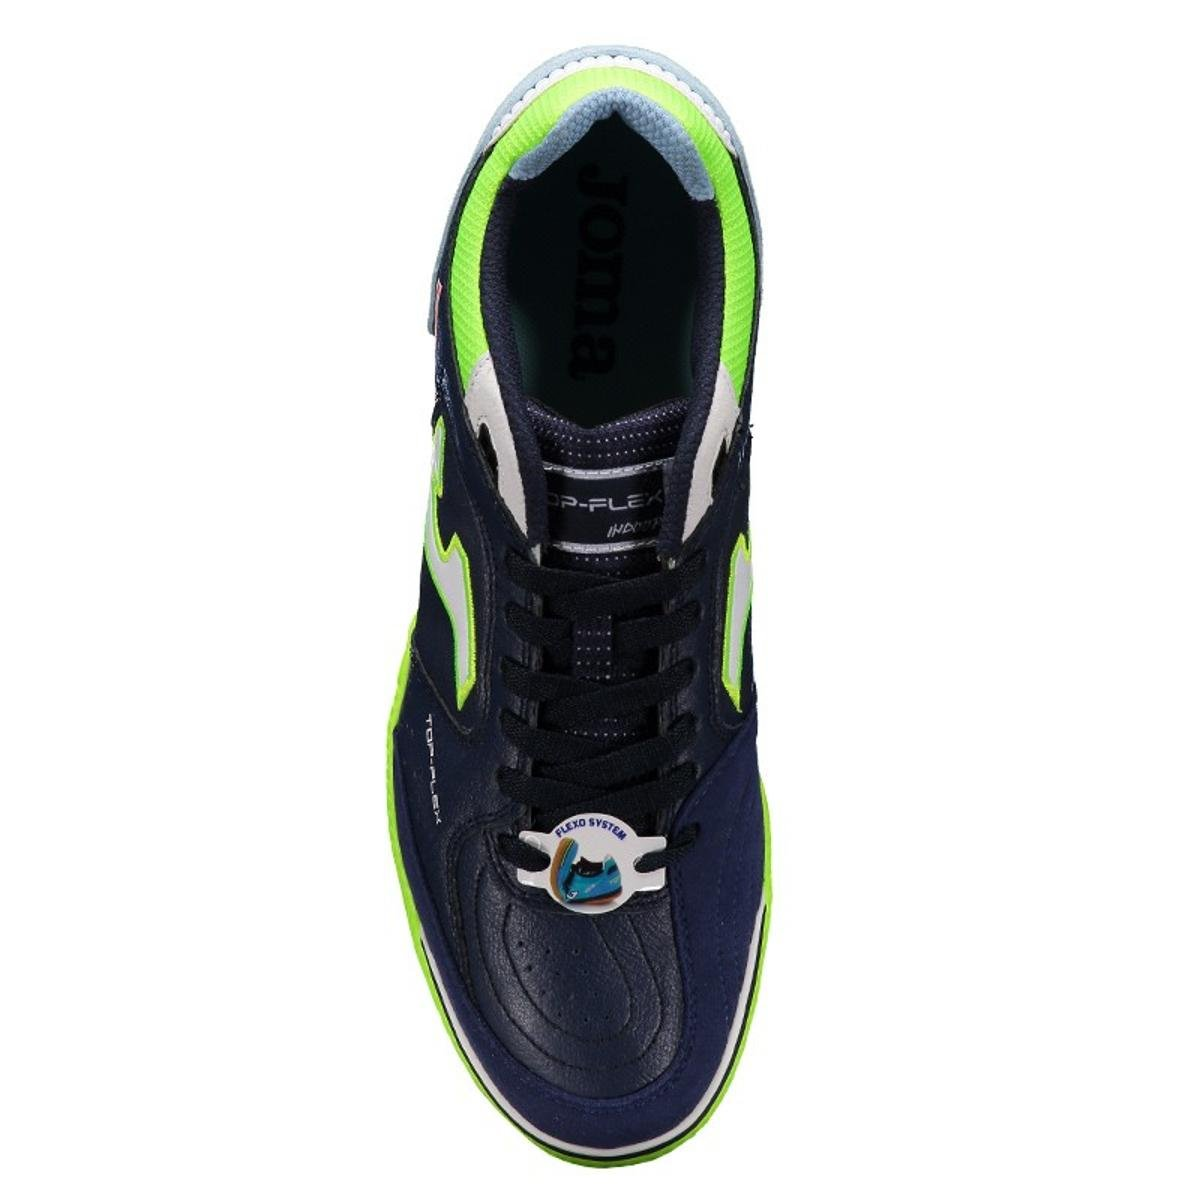 afc49024ac Chuteira Joma Top Flex Futsal Masculina - Compre Agora